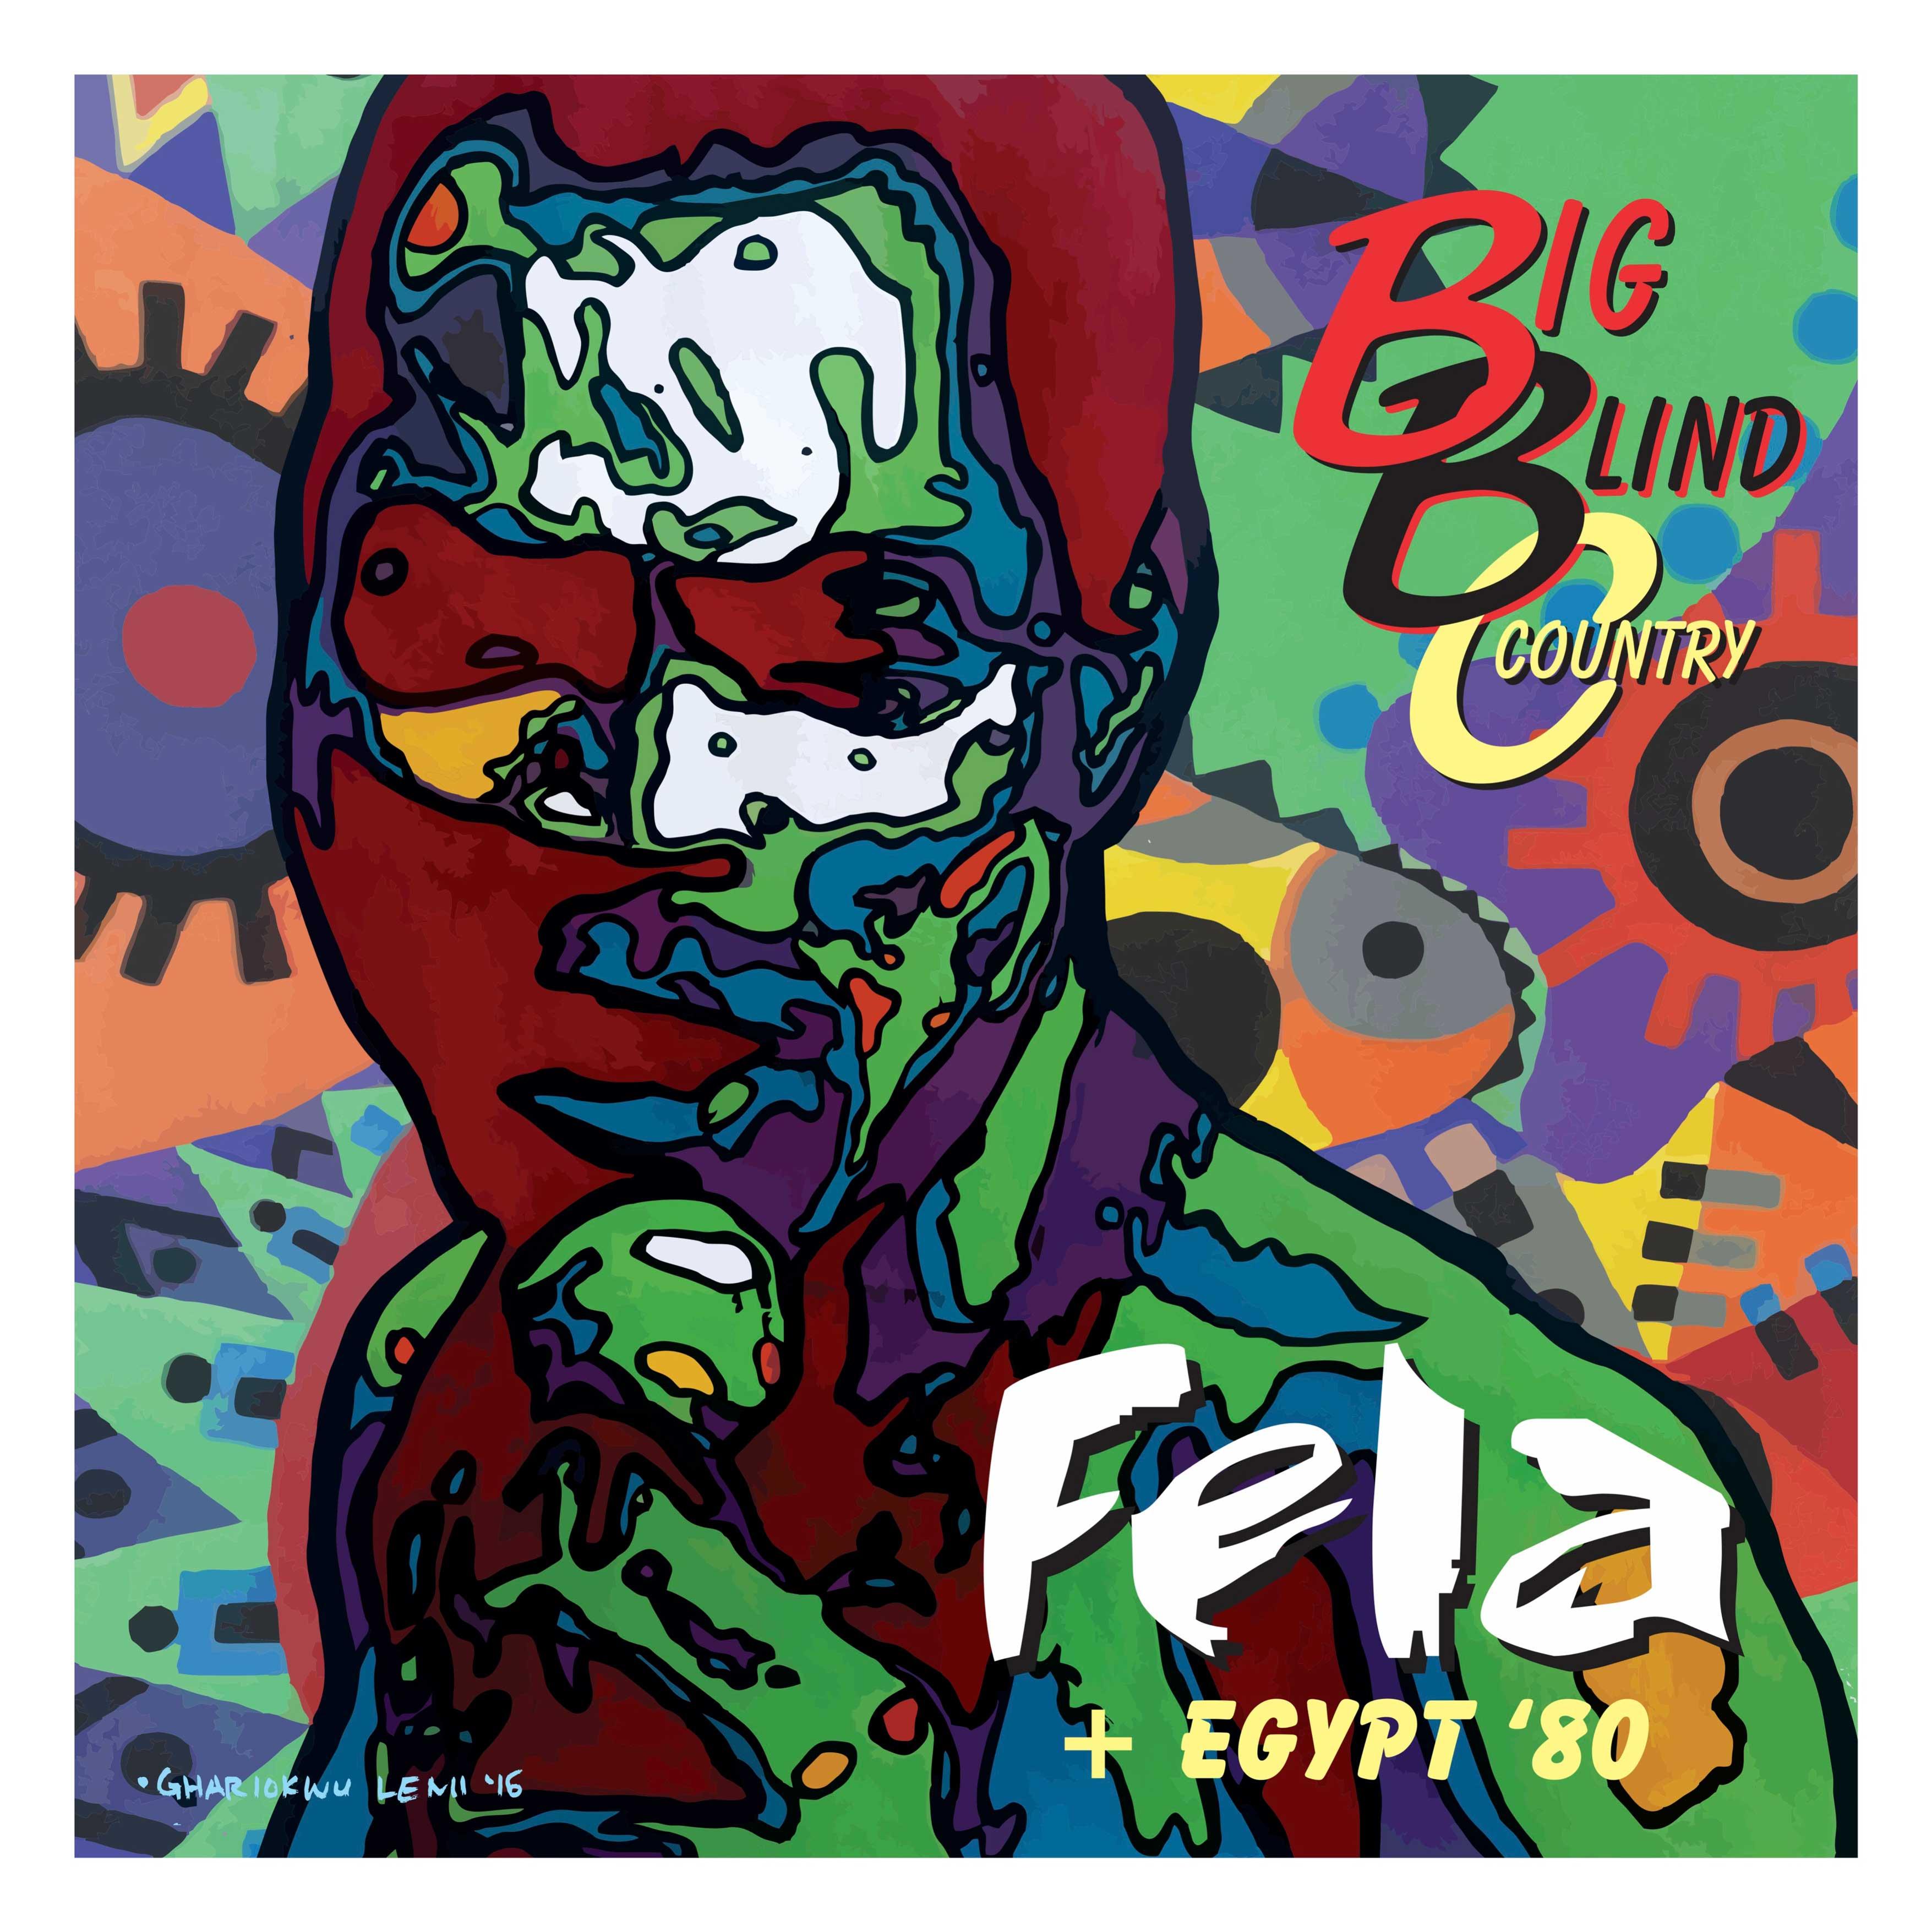 Lemi Ghariokwu's take on Fela Kuti & Egypt 80's Big Blind Country.